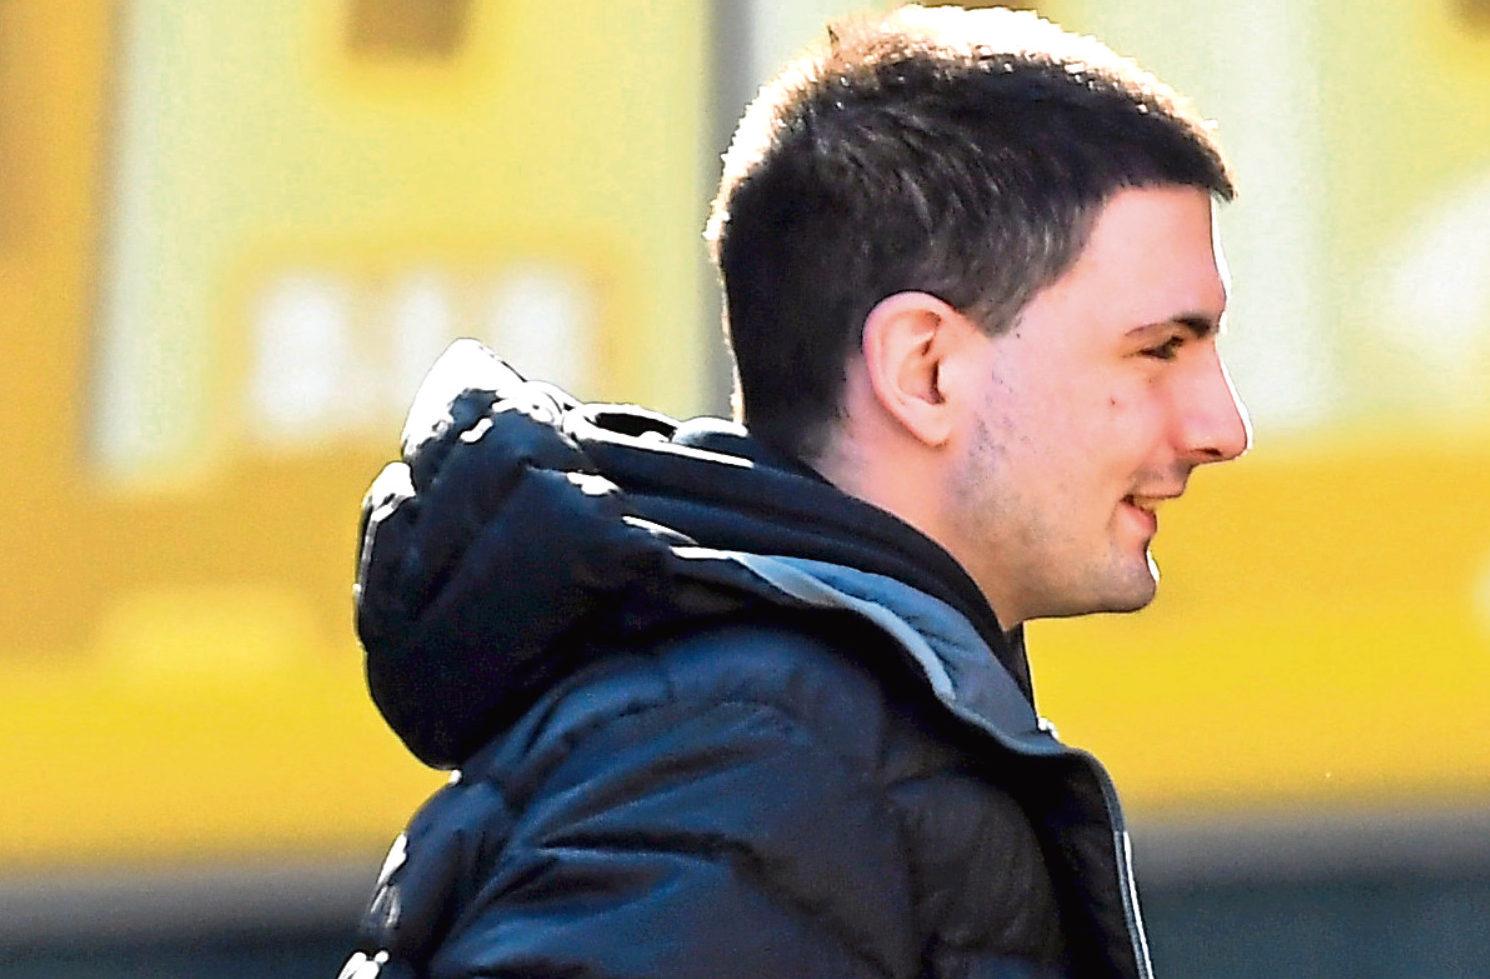 Paul Jessiman walked free from Aberdeen Sheriff Court